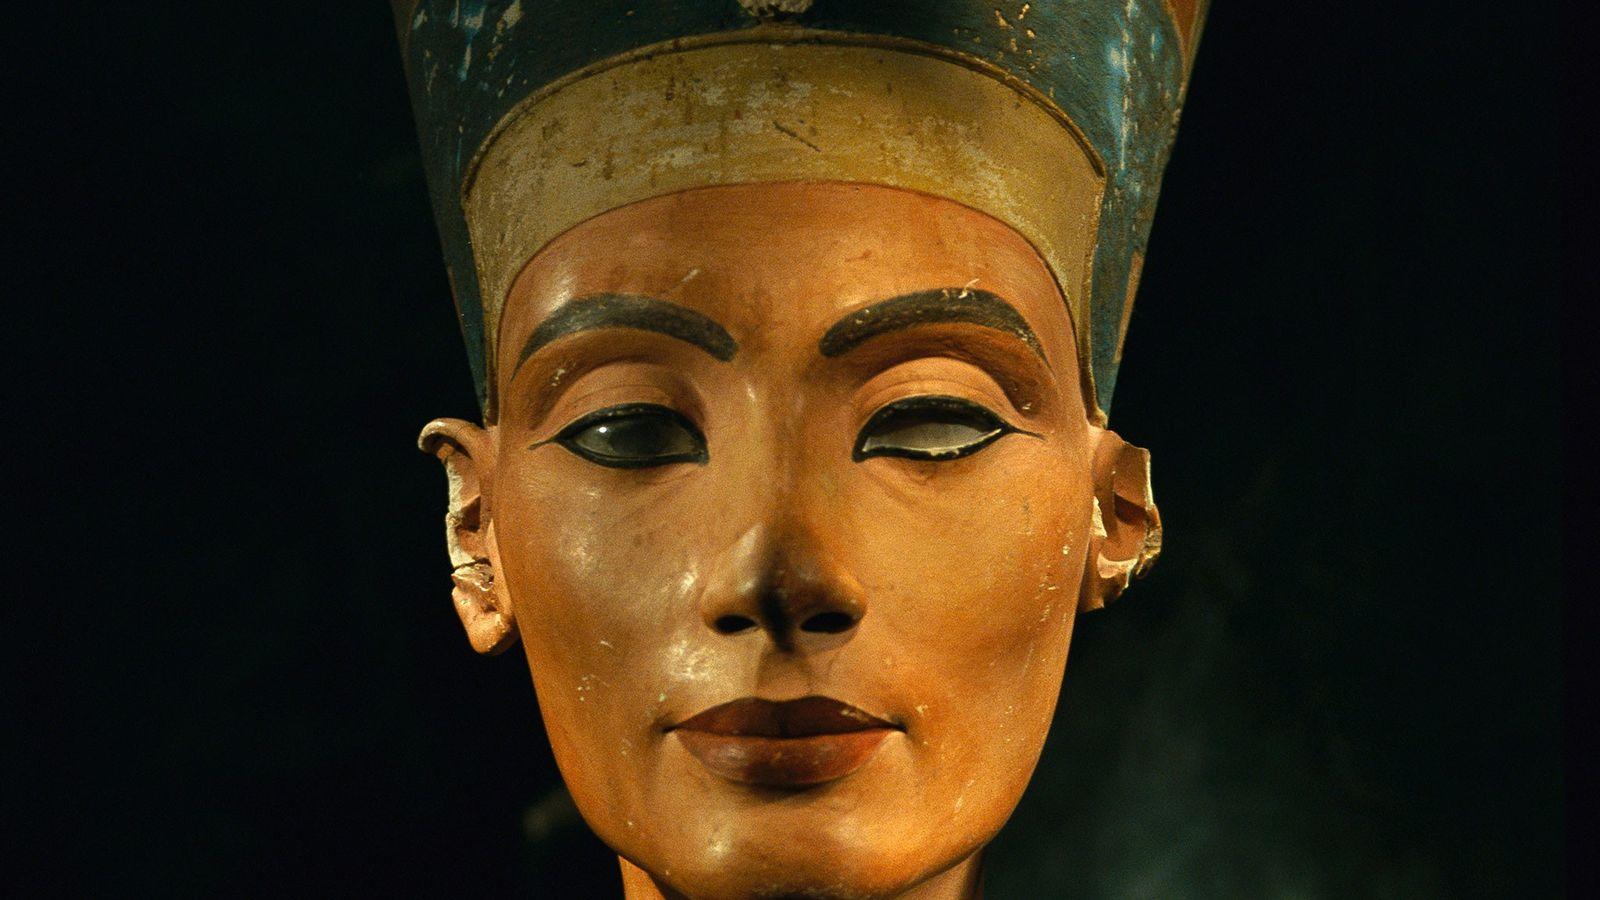 Bust of Egyptian Queen Nefertiti.